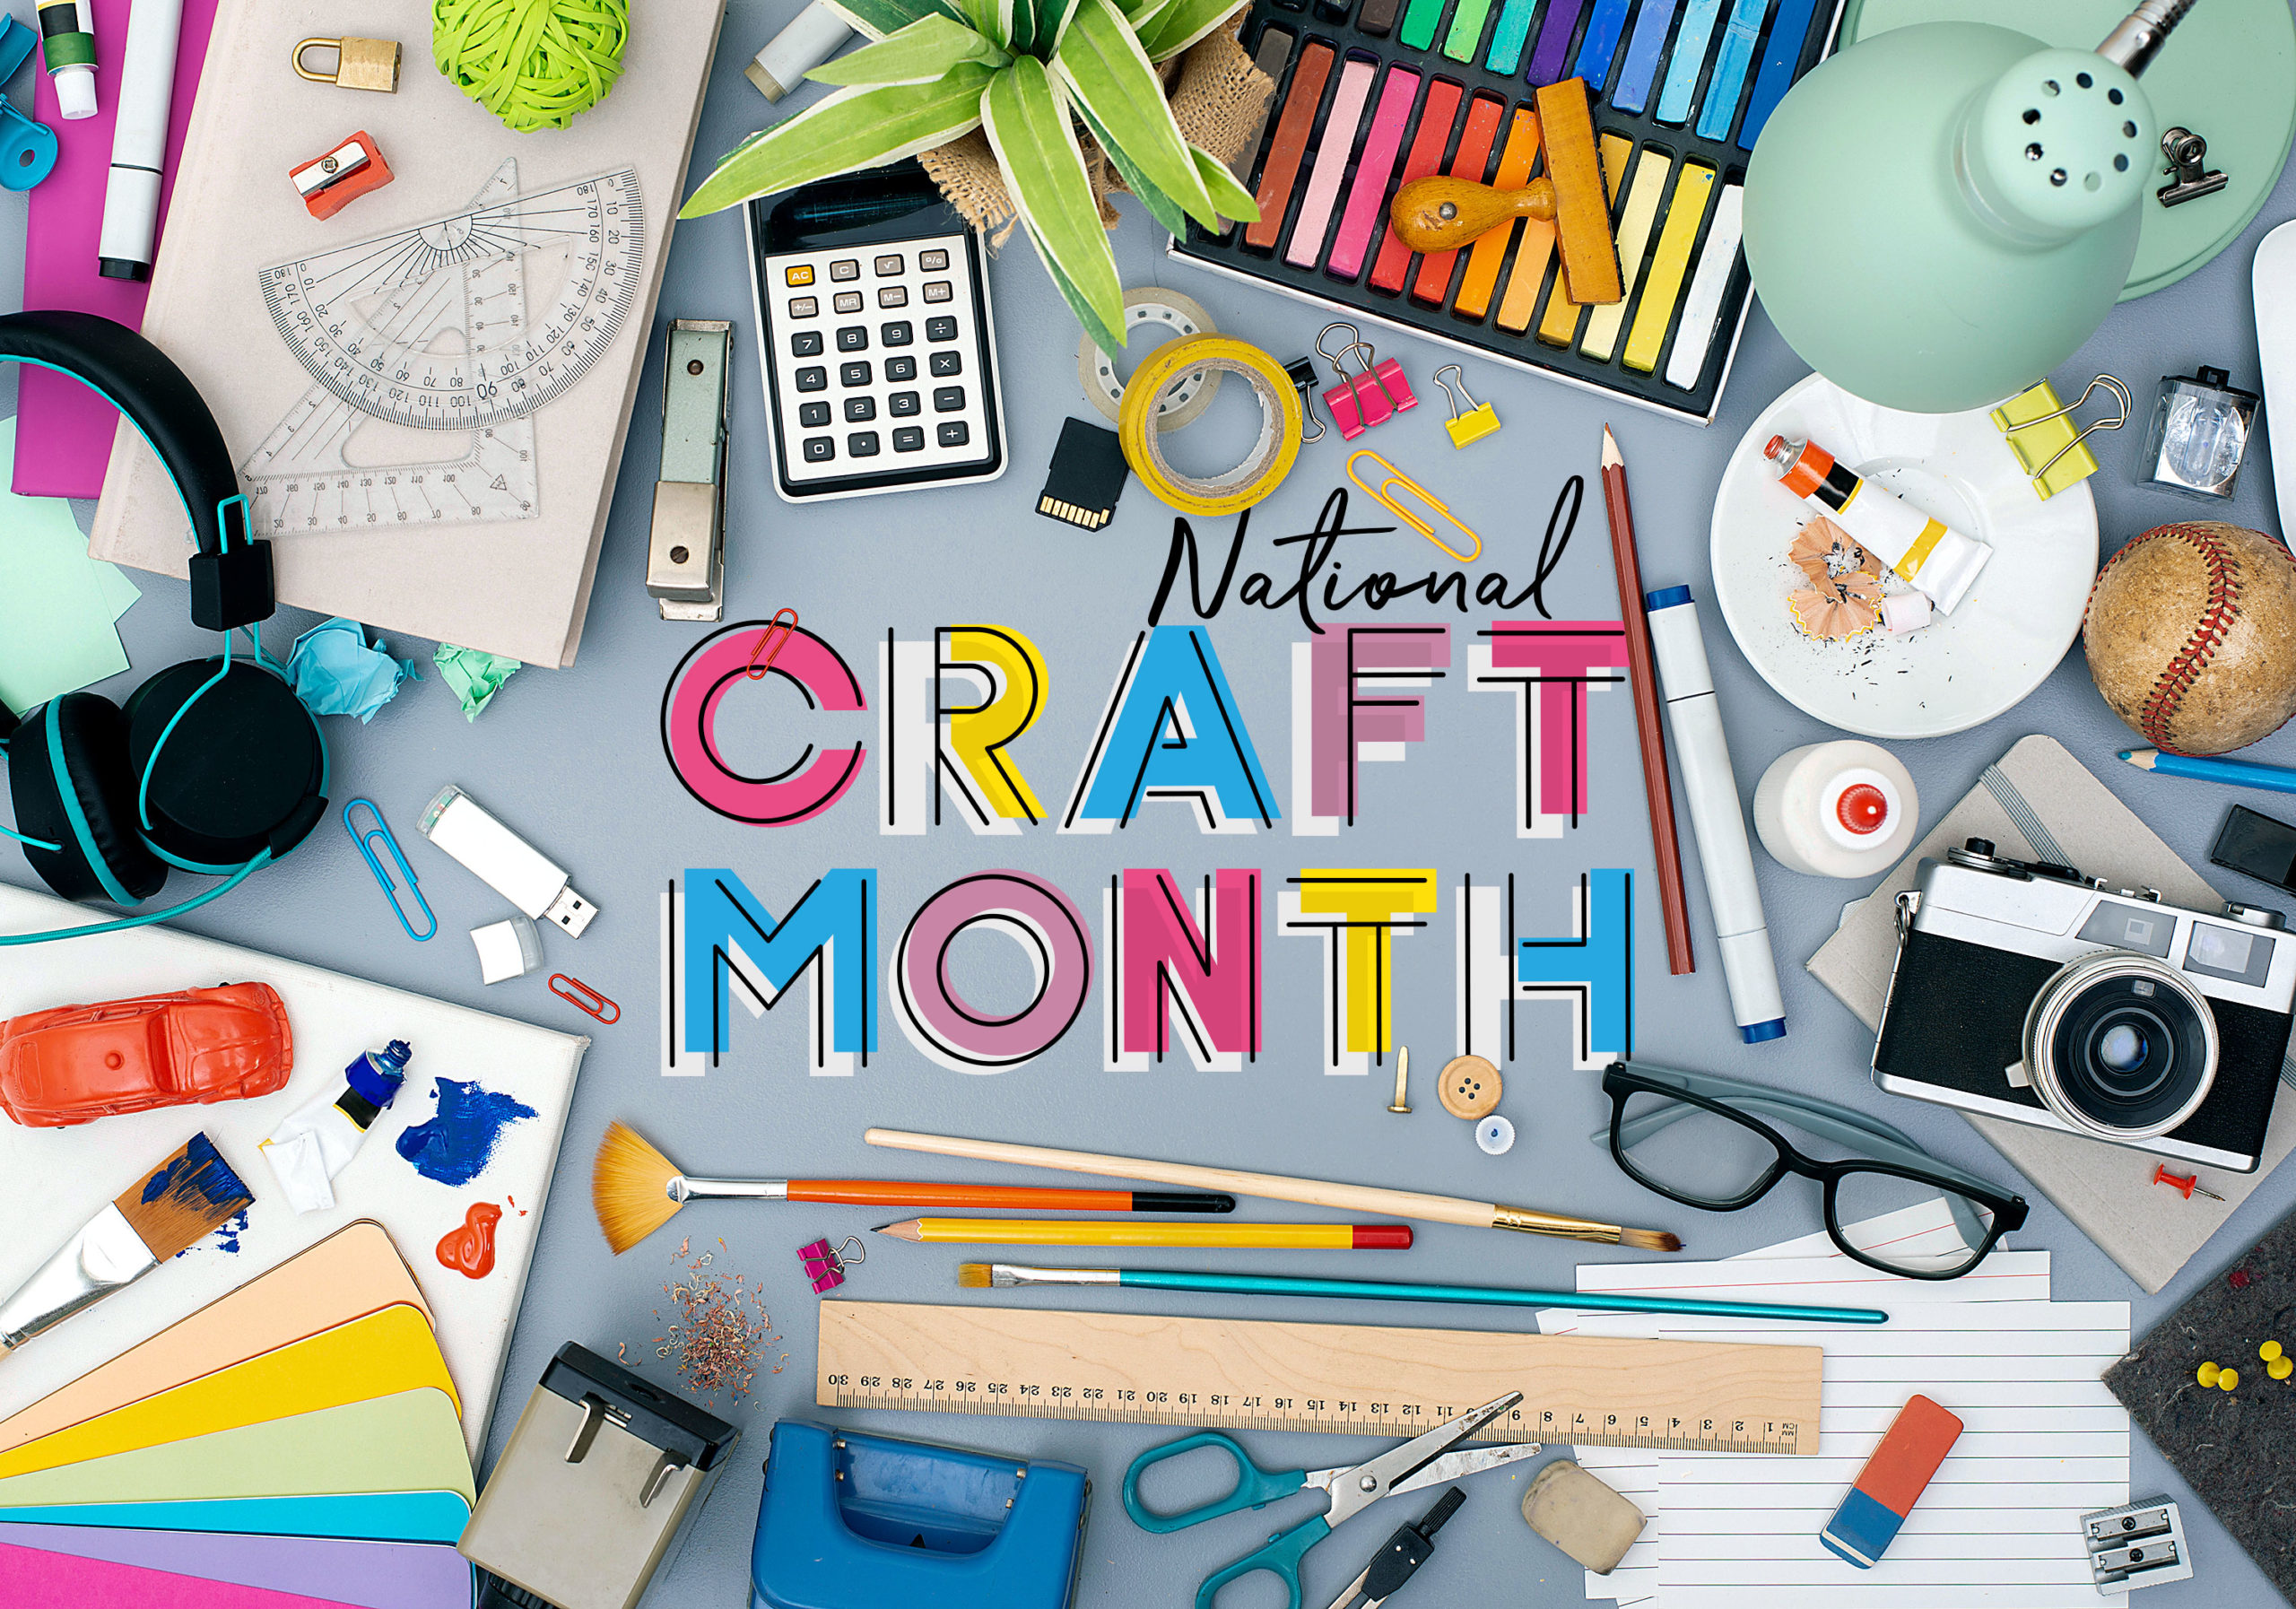 national craft month craft supplies